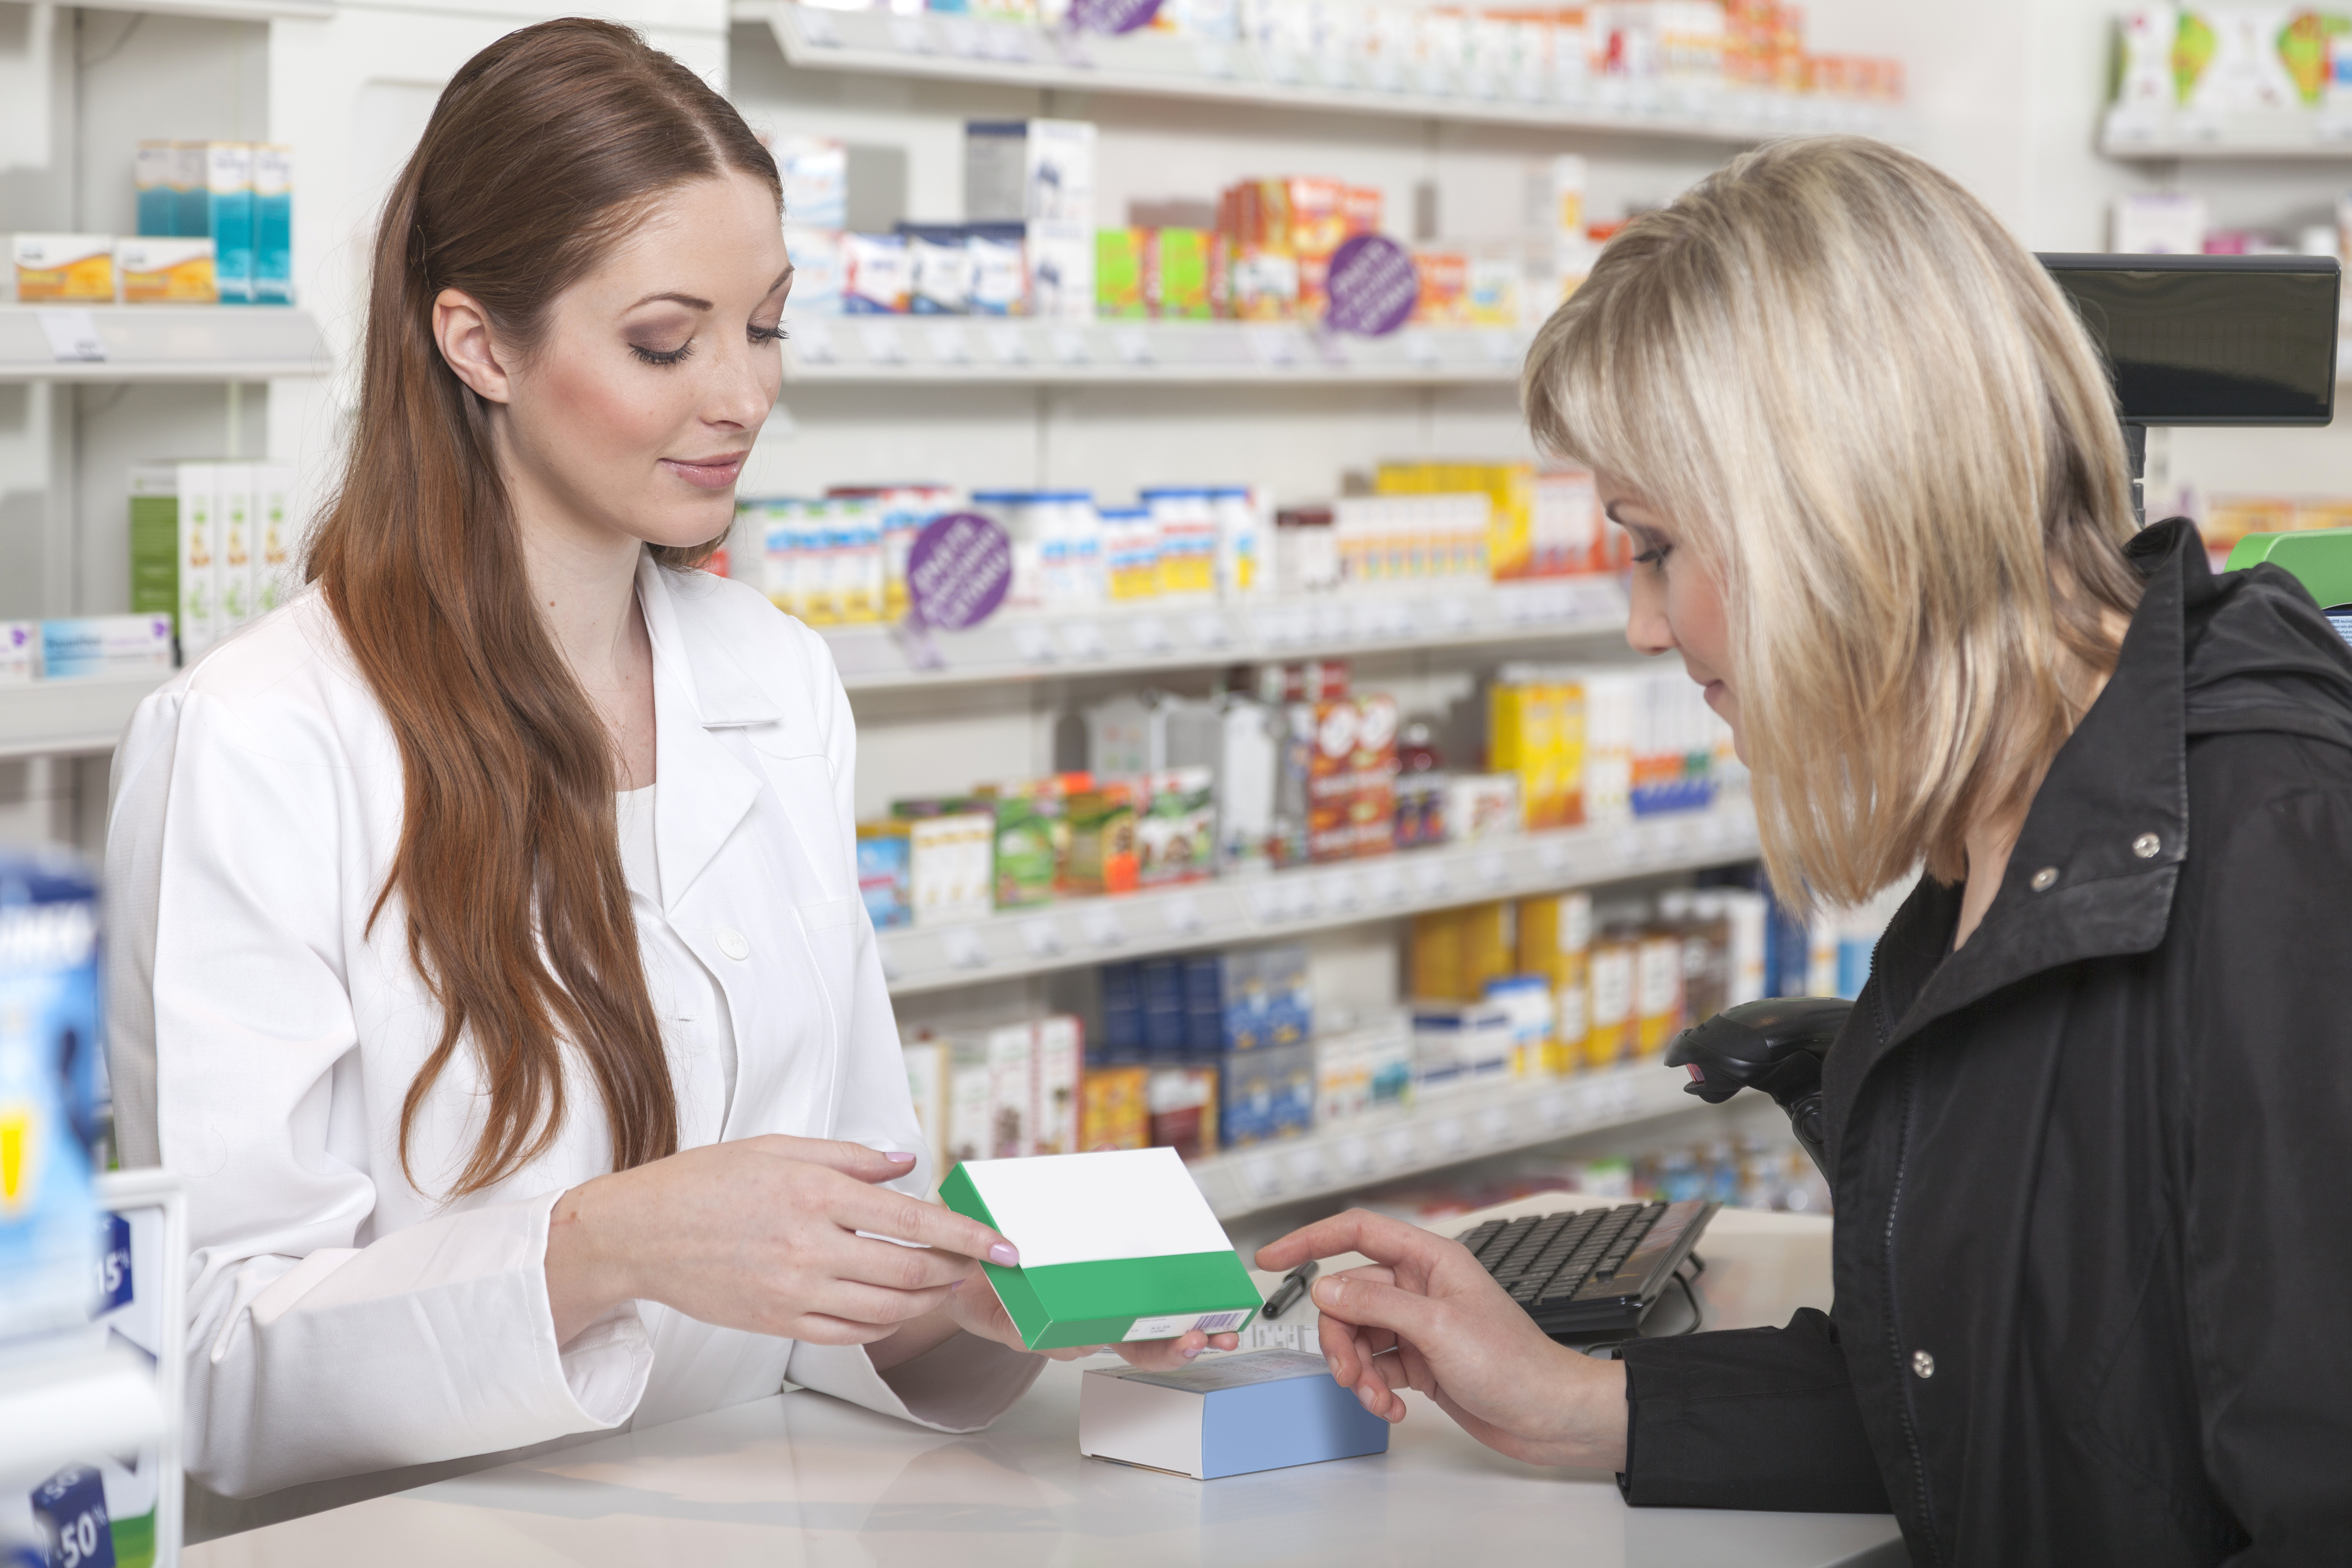 new consultation skills resource for community pharmacy